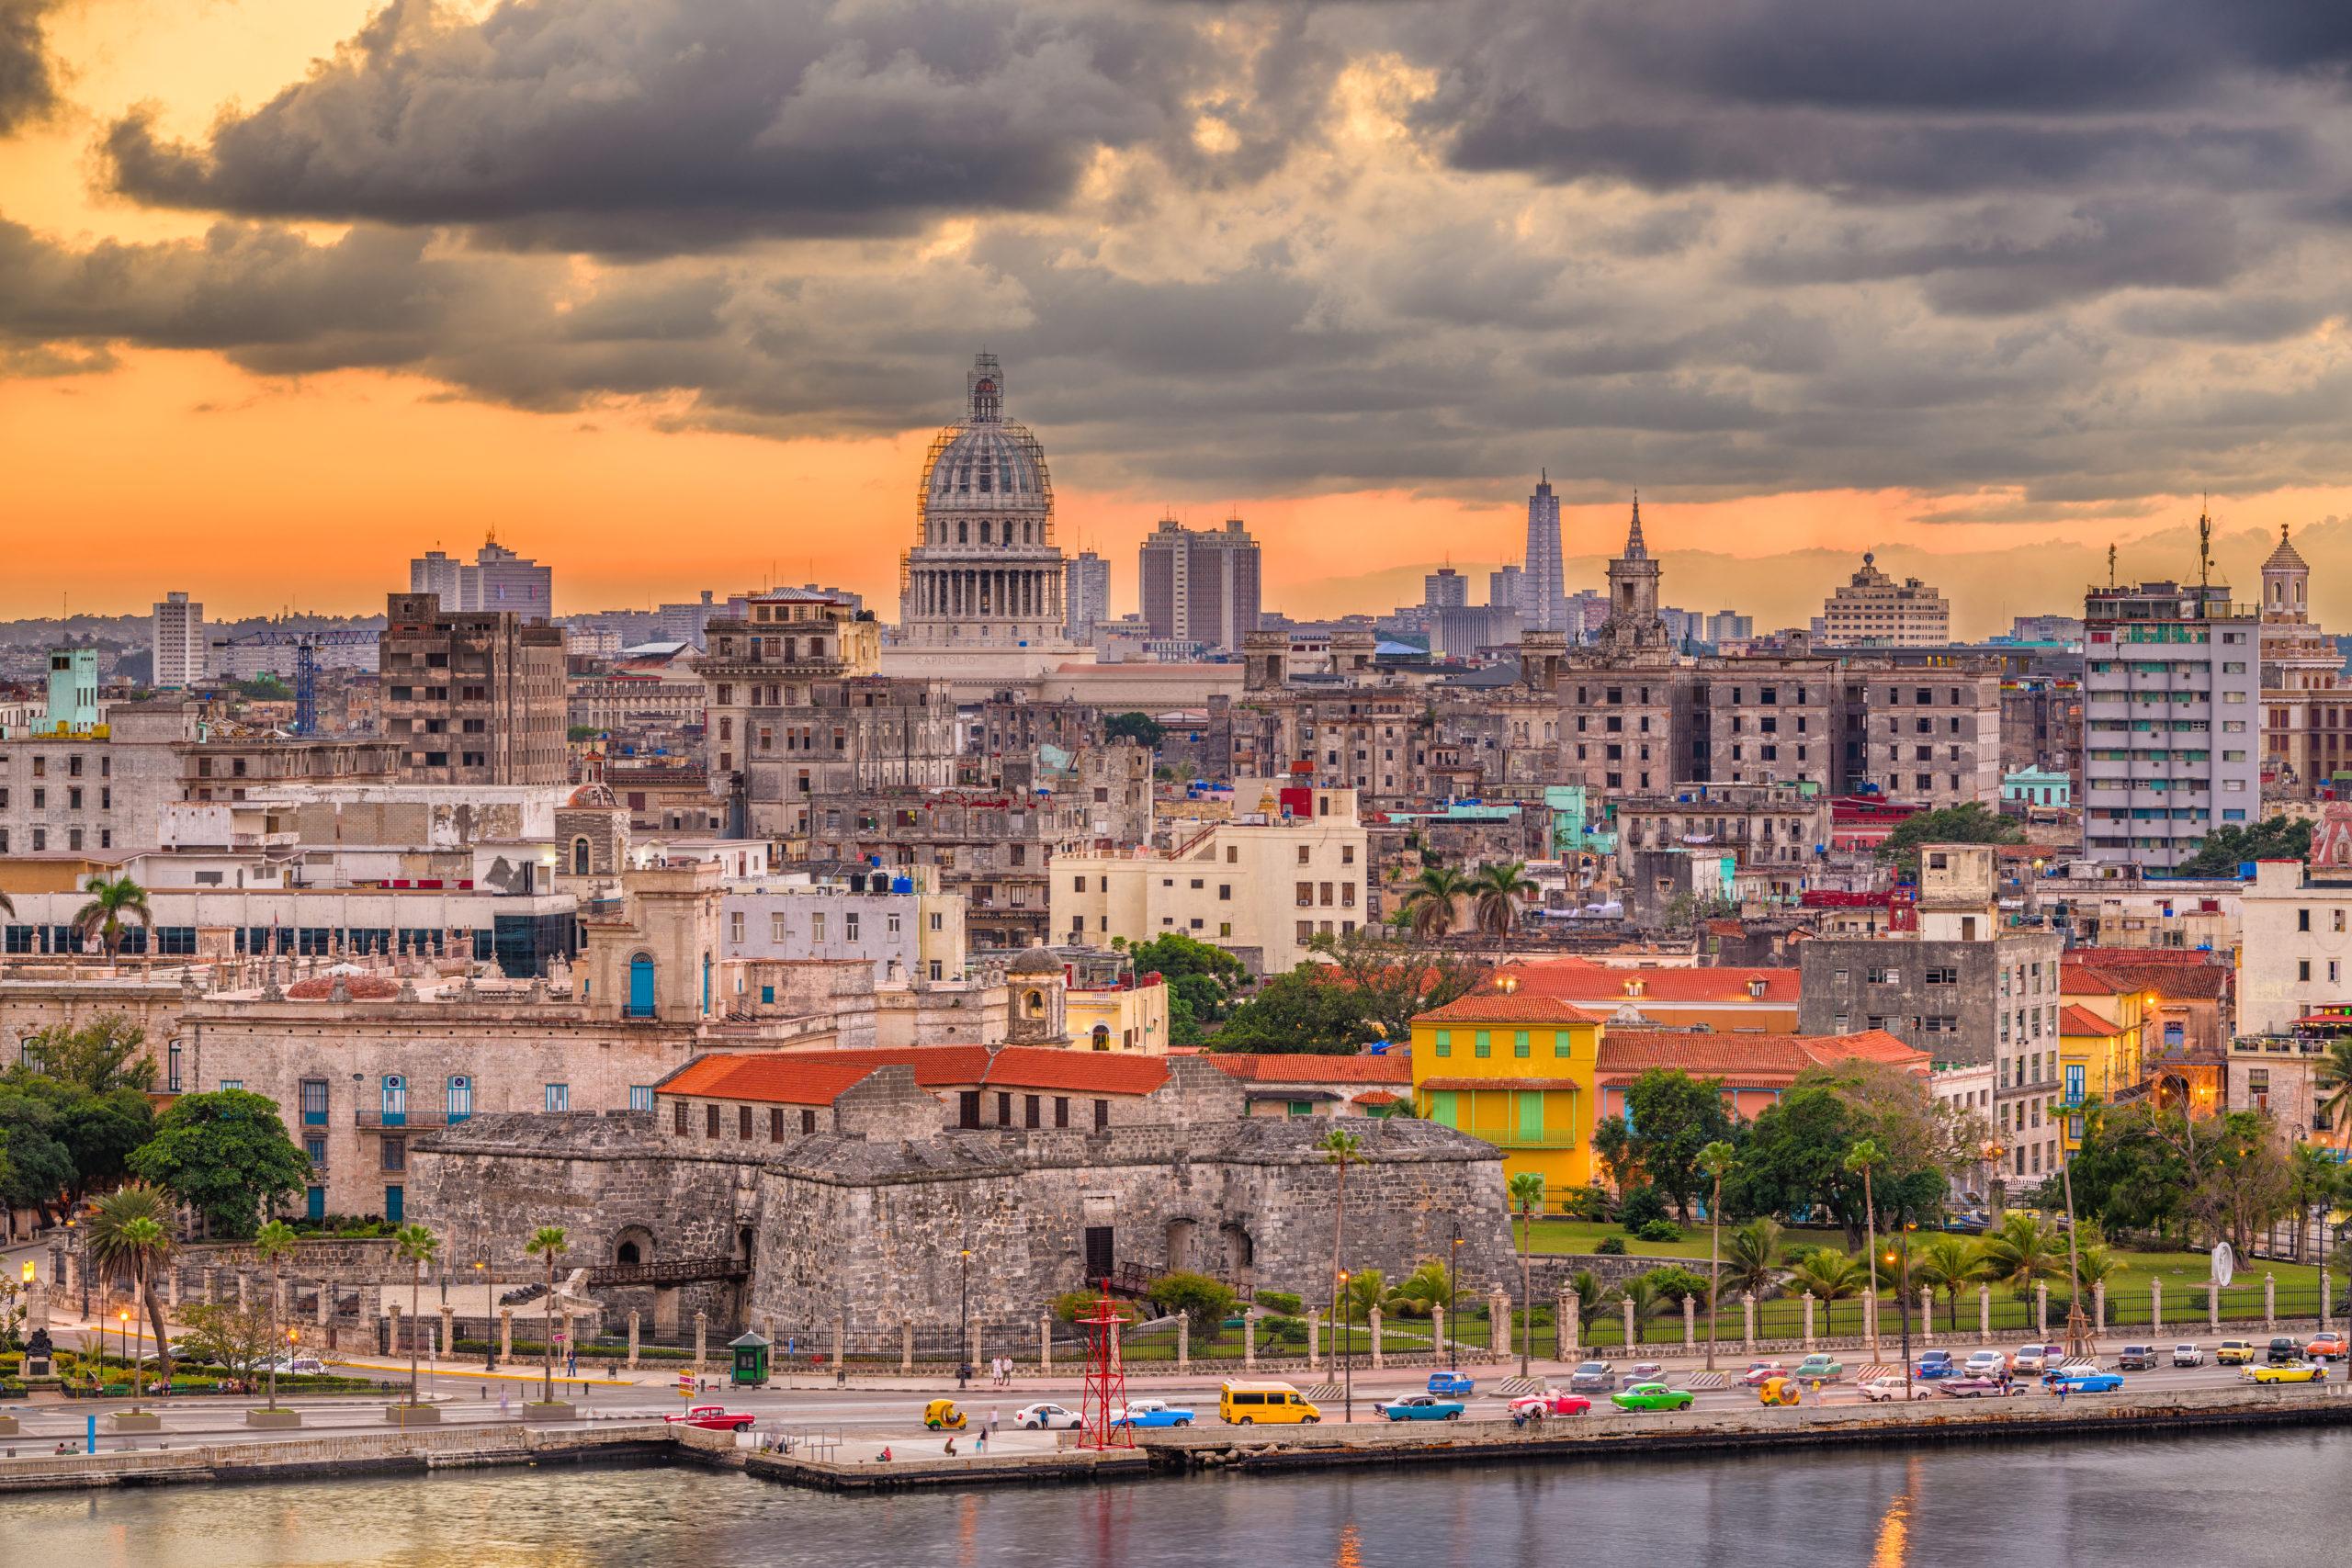 Kuba ohne Covid Reisebeschränkungen